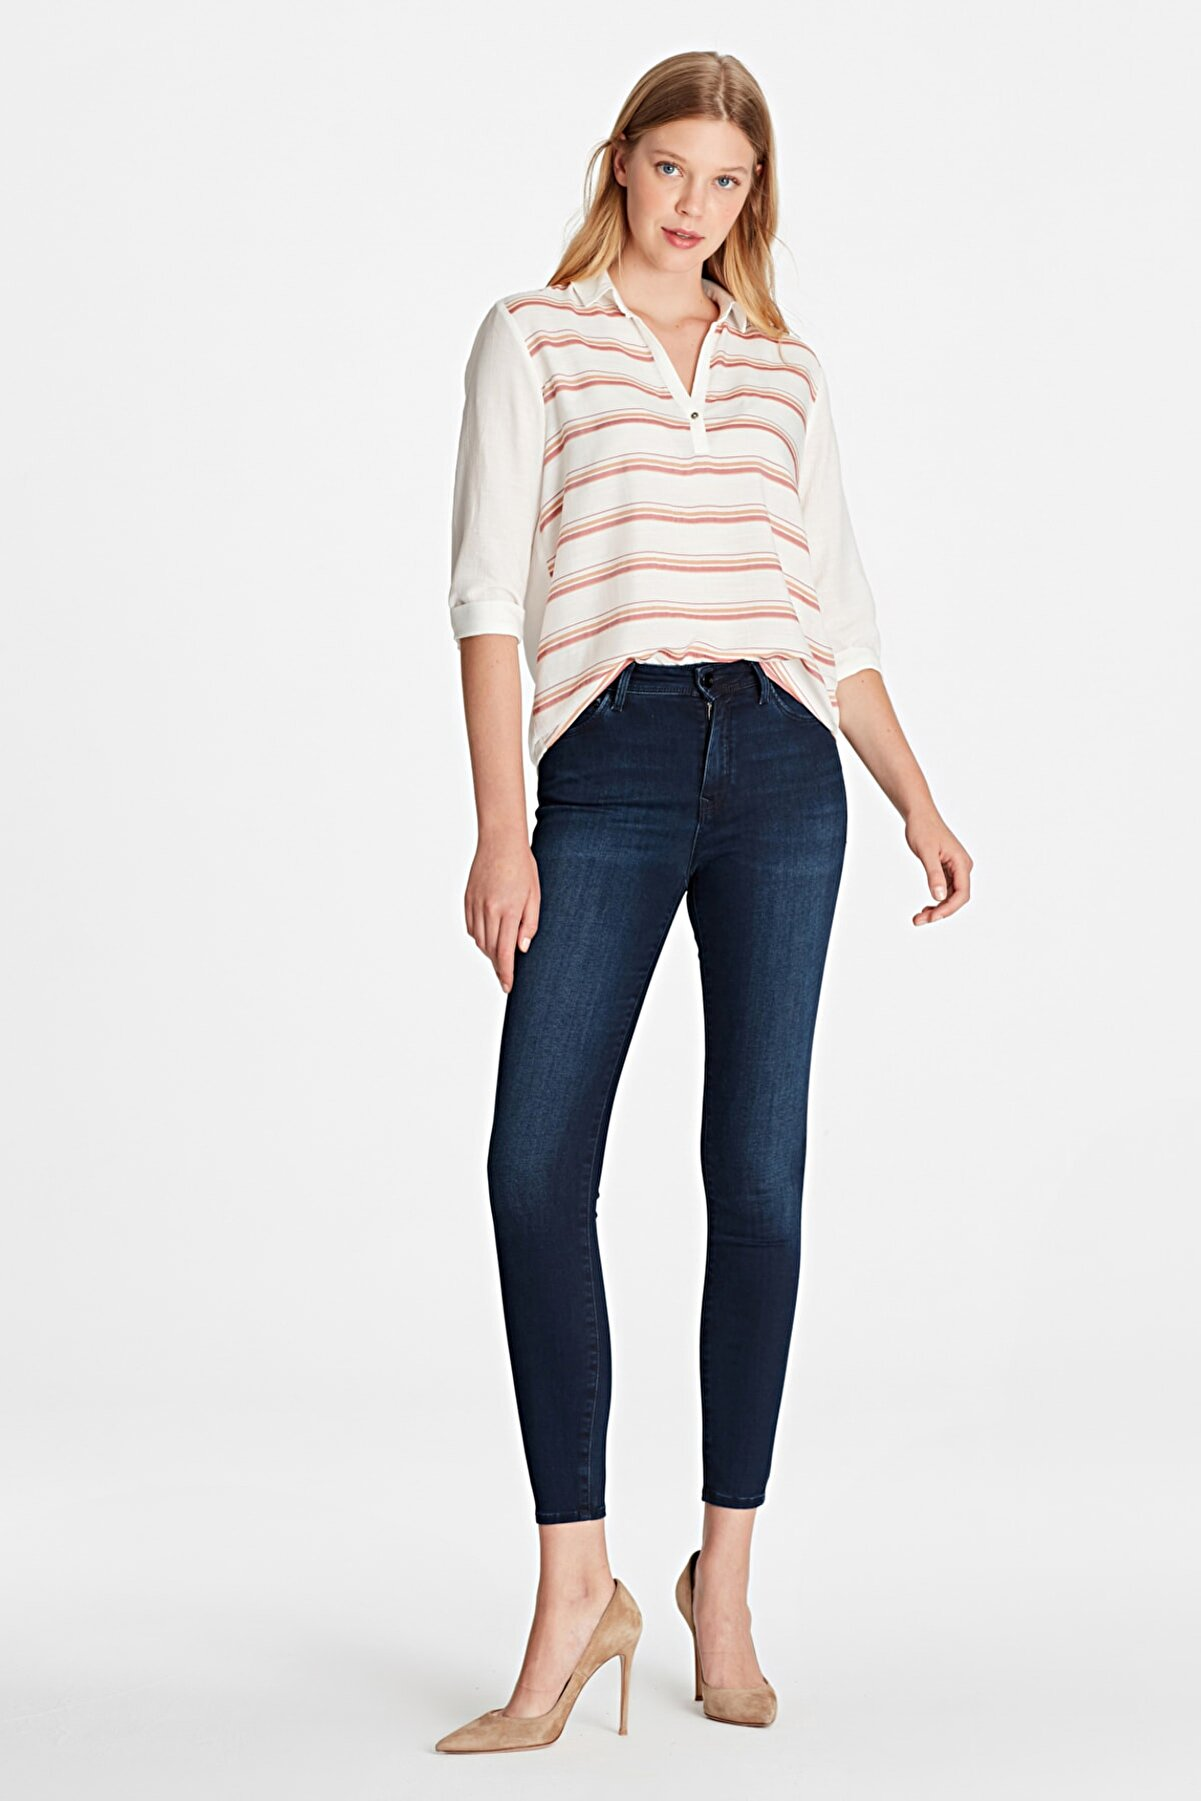 Mavi Kadın Tess Gold Lux Move Tencel Jean Pantolon  100328-24285